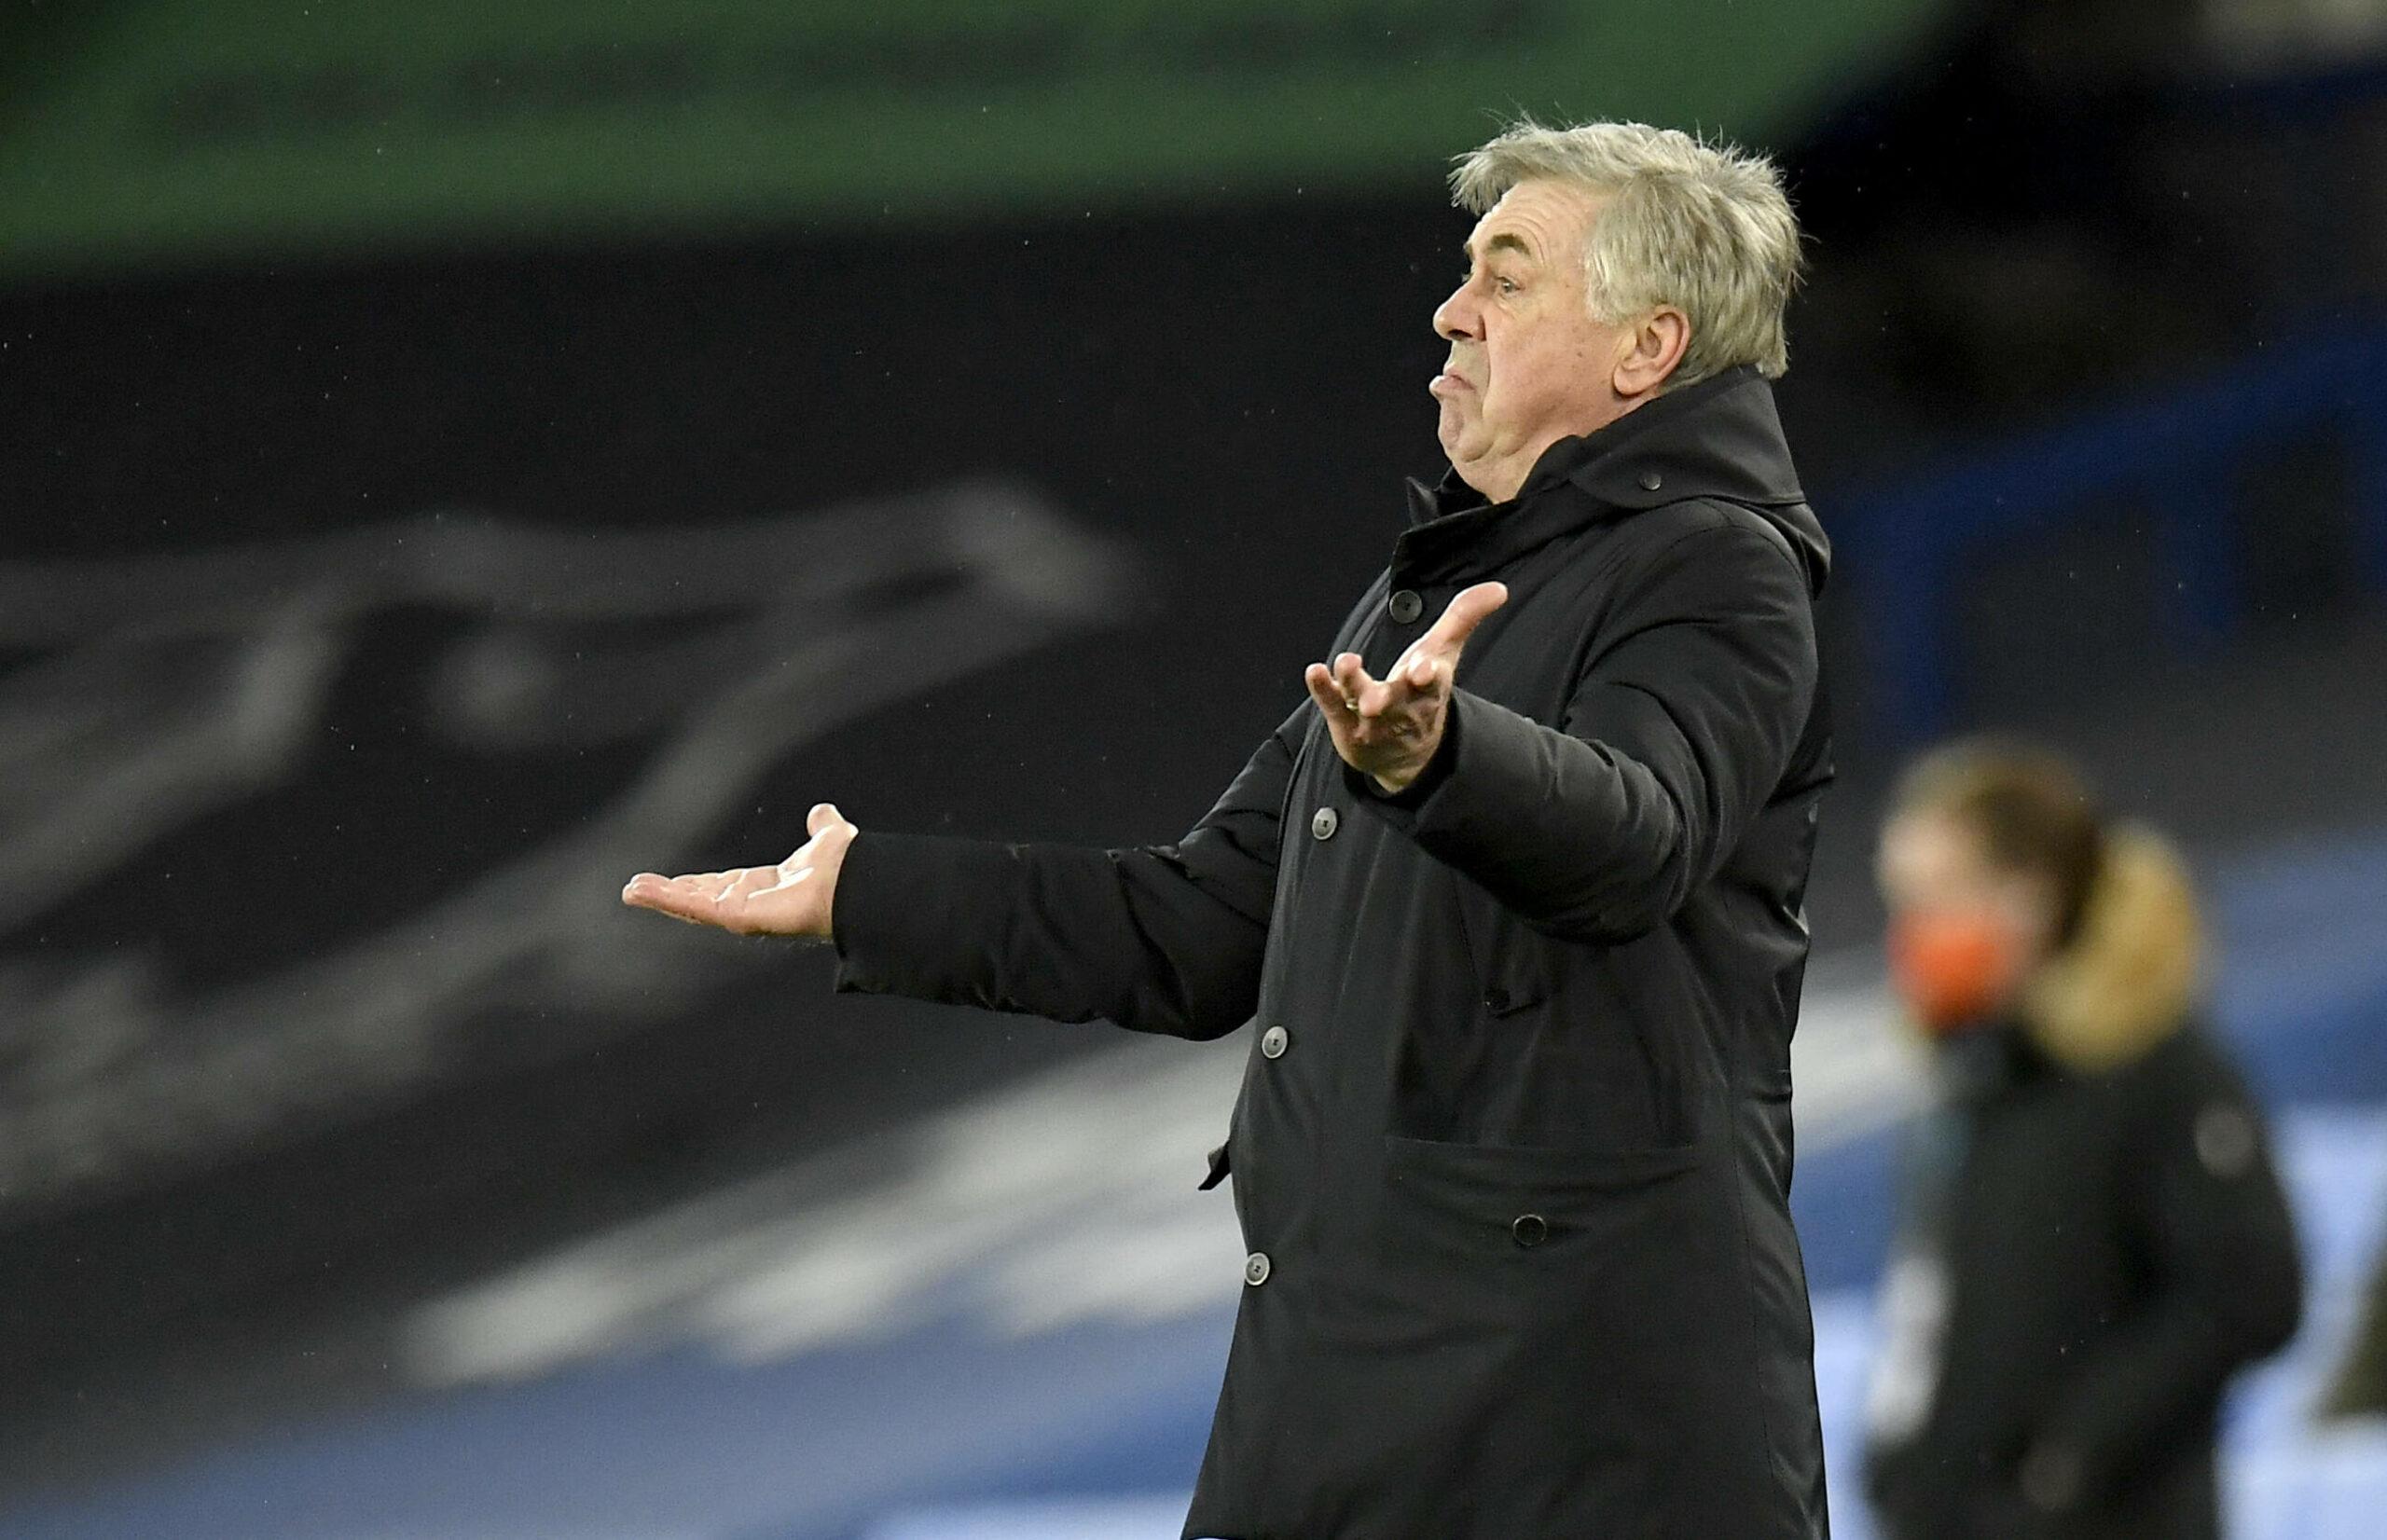 Ancelotti's worst nightmare: How one loss derailed Everton's stellar season